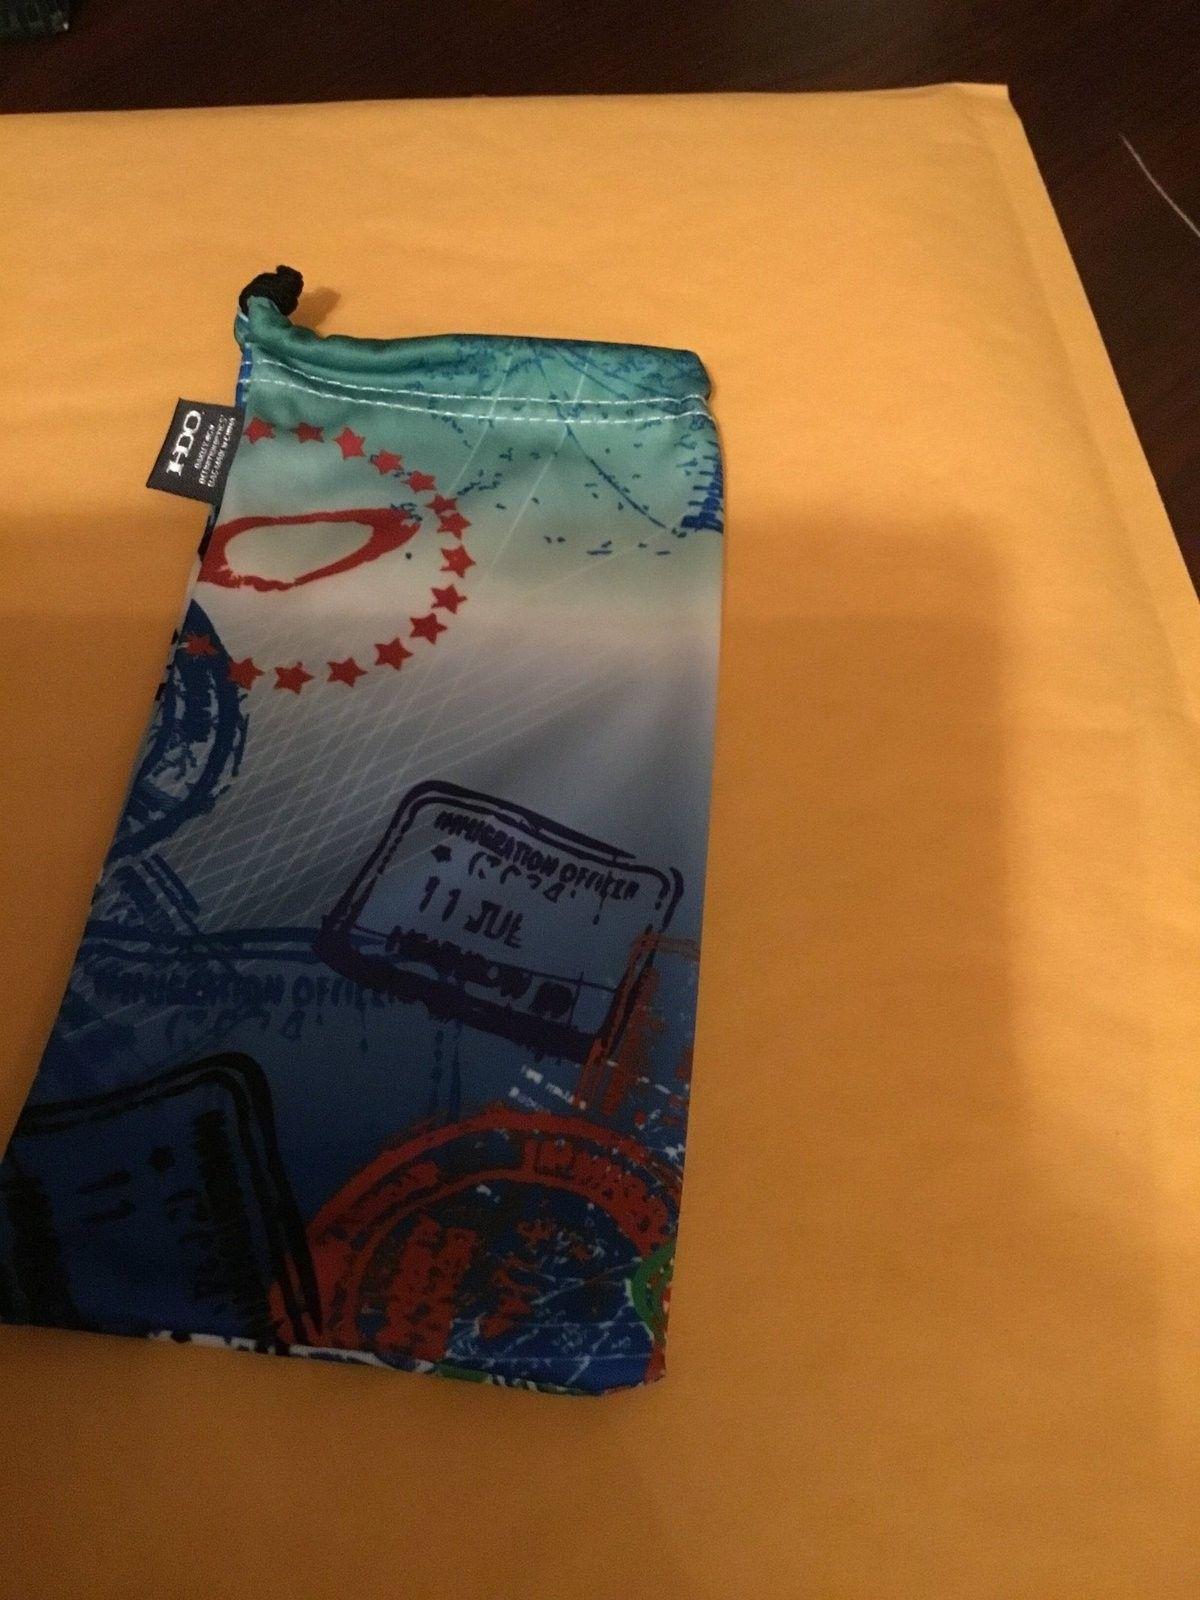 Travel Retail Micro Bag for Black Mechanism Keychain - image.jpeg